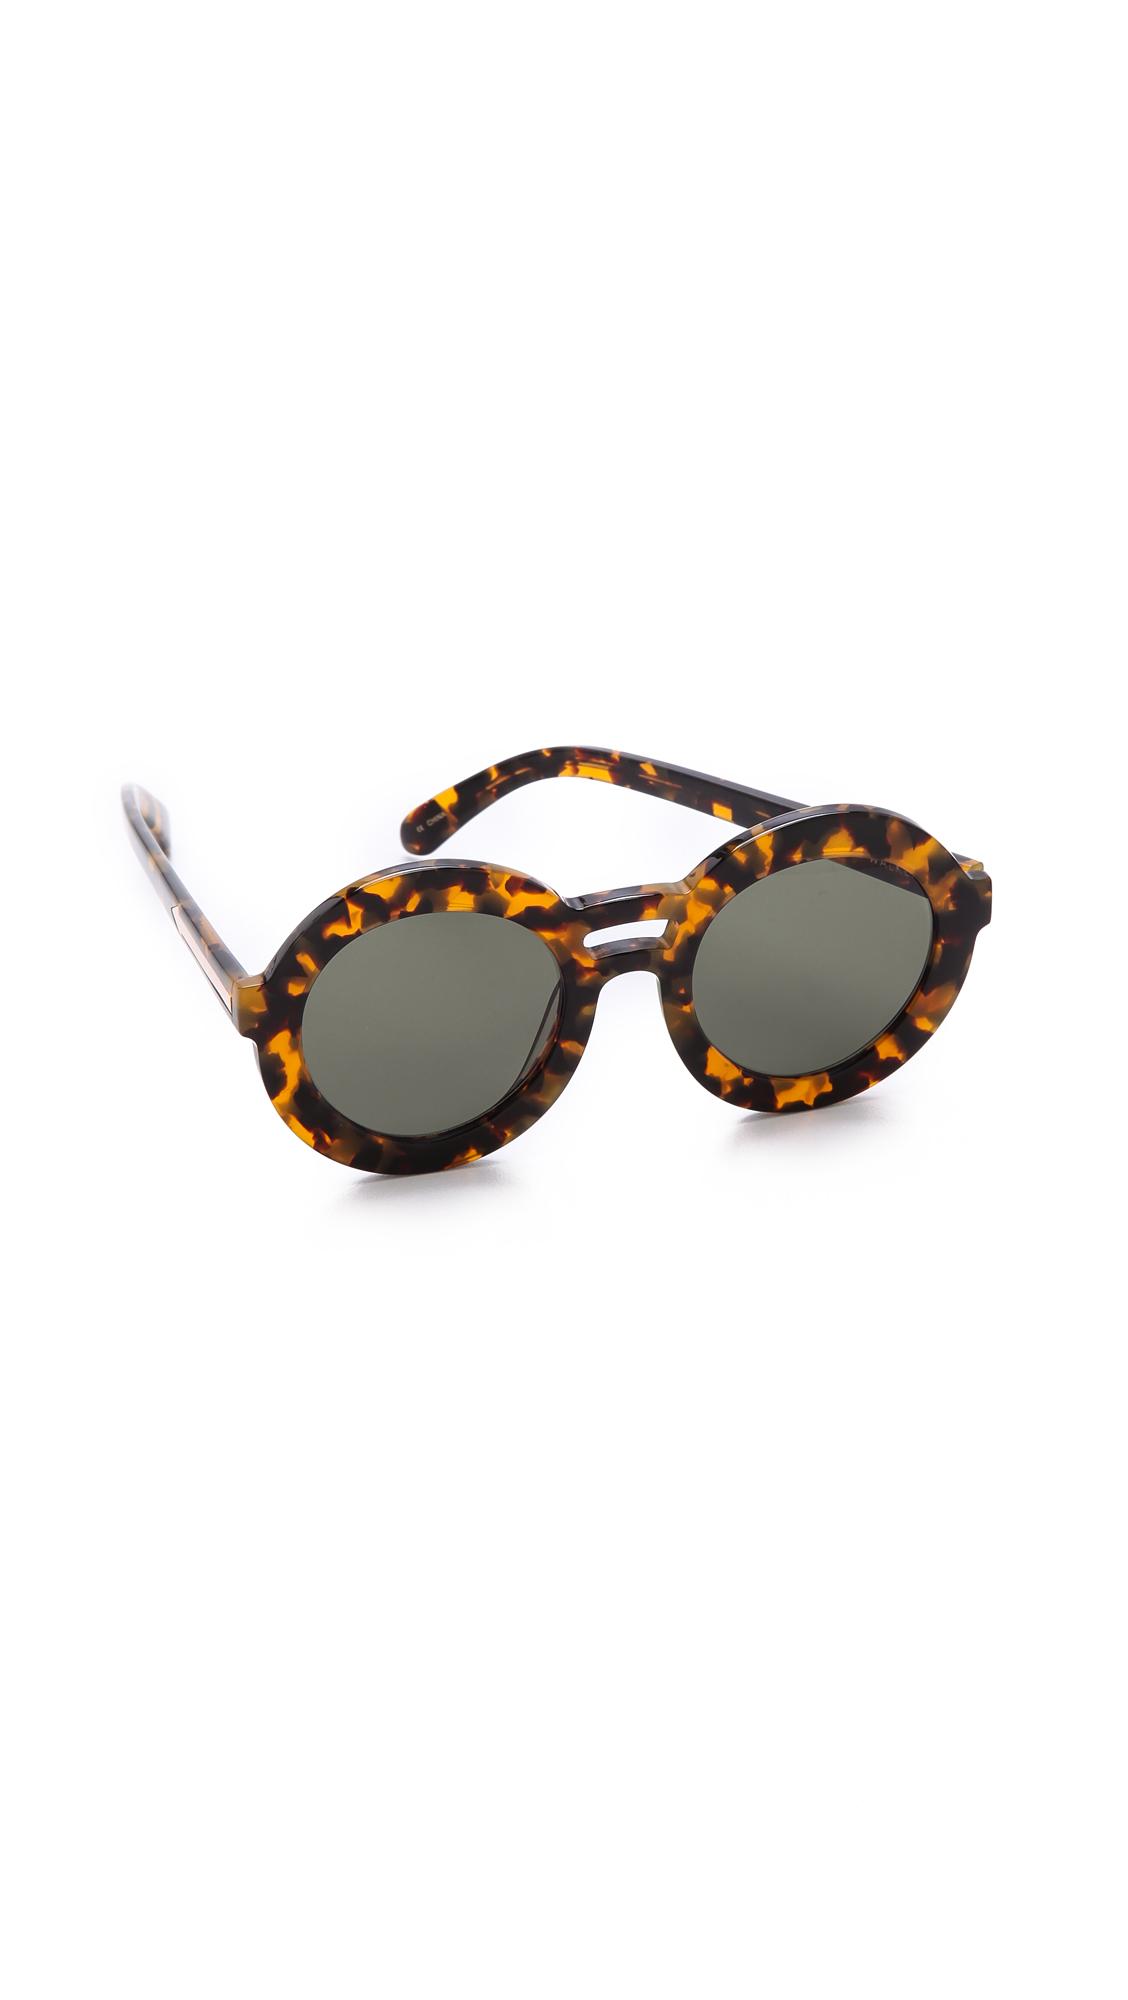 4afaa818fbb Karen Walker Joyous Sunglasses